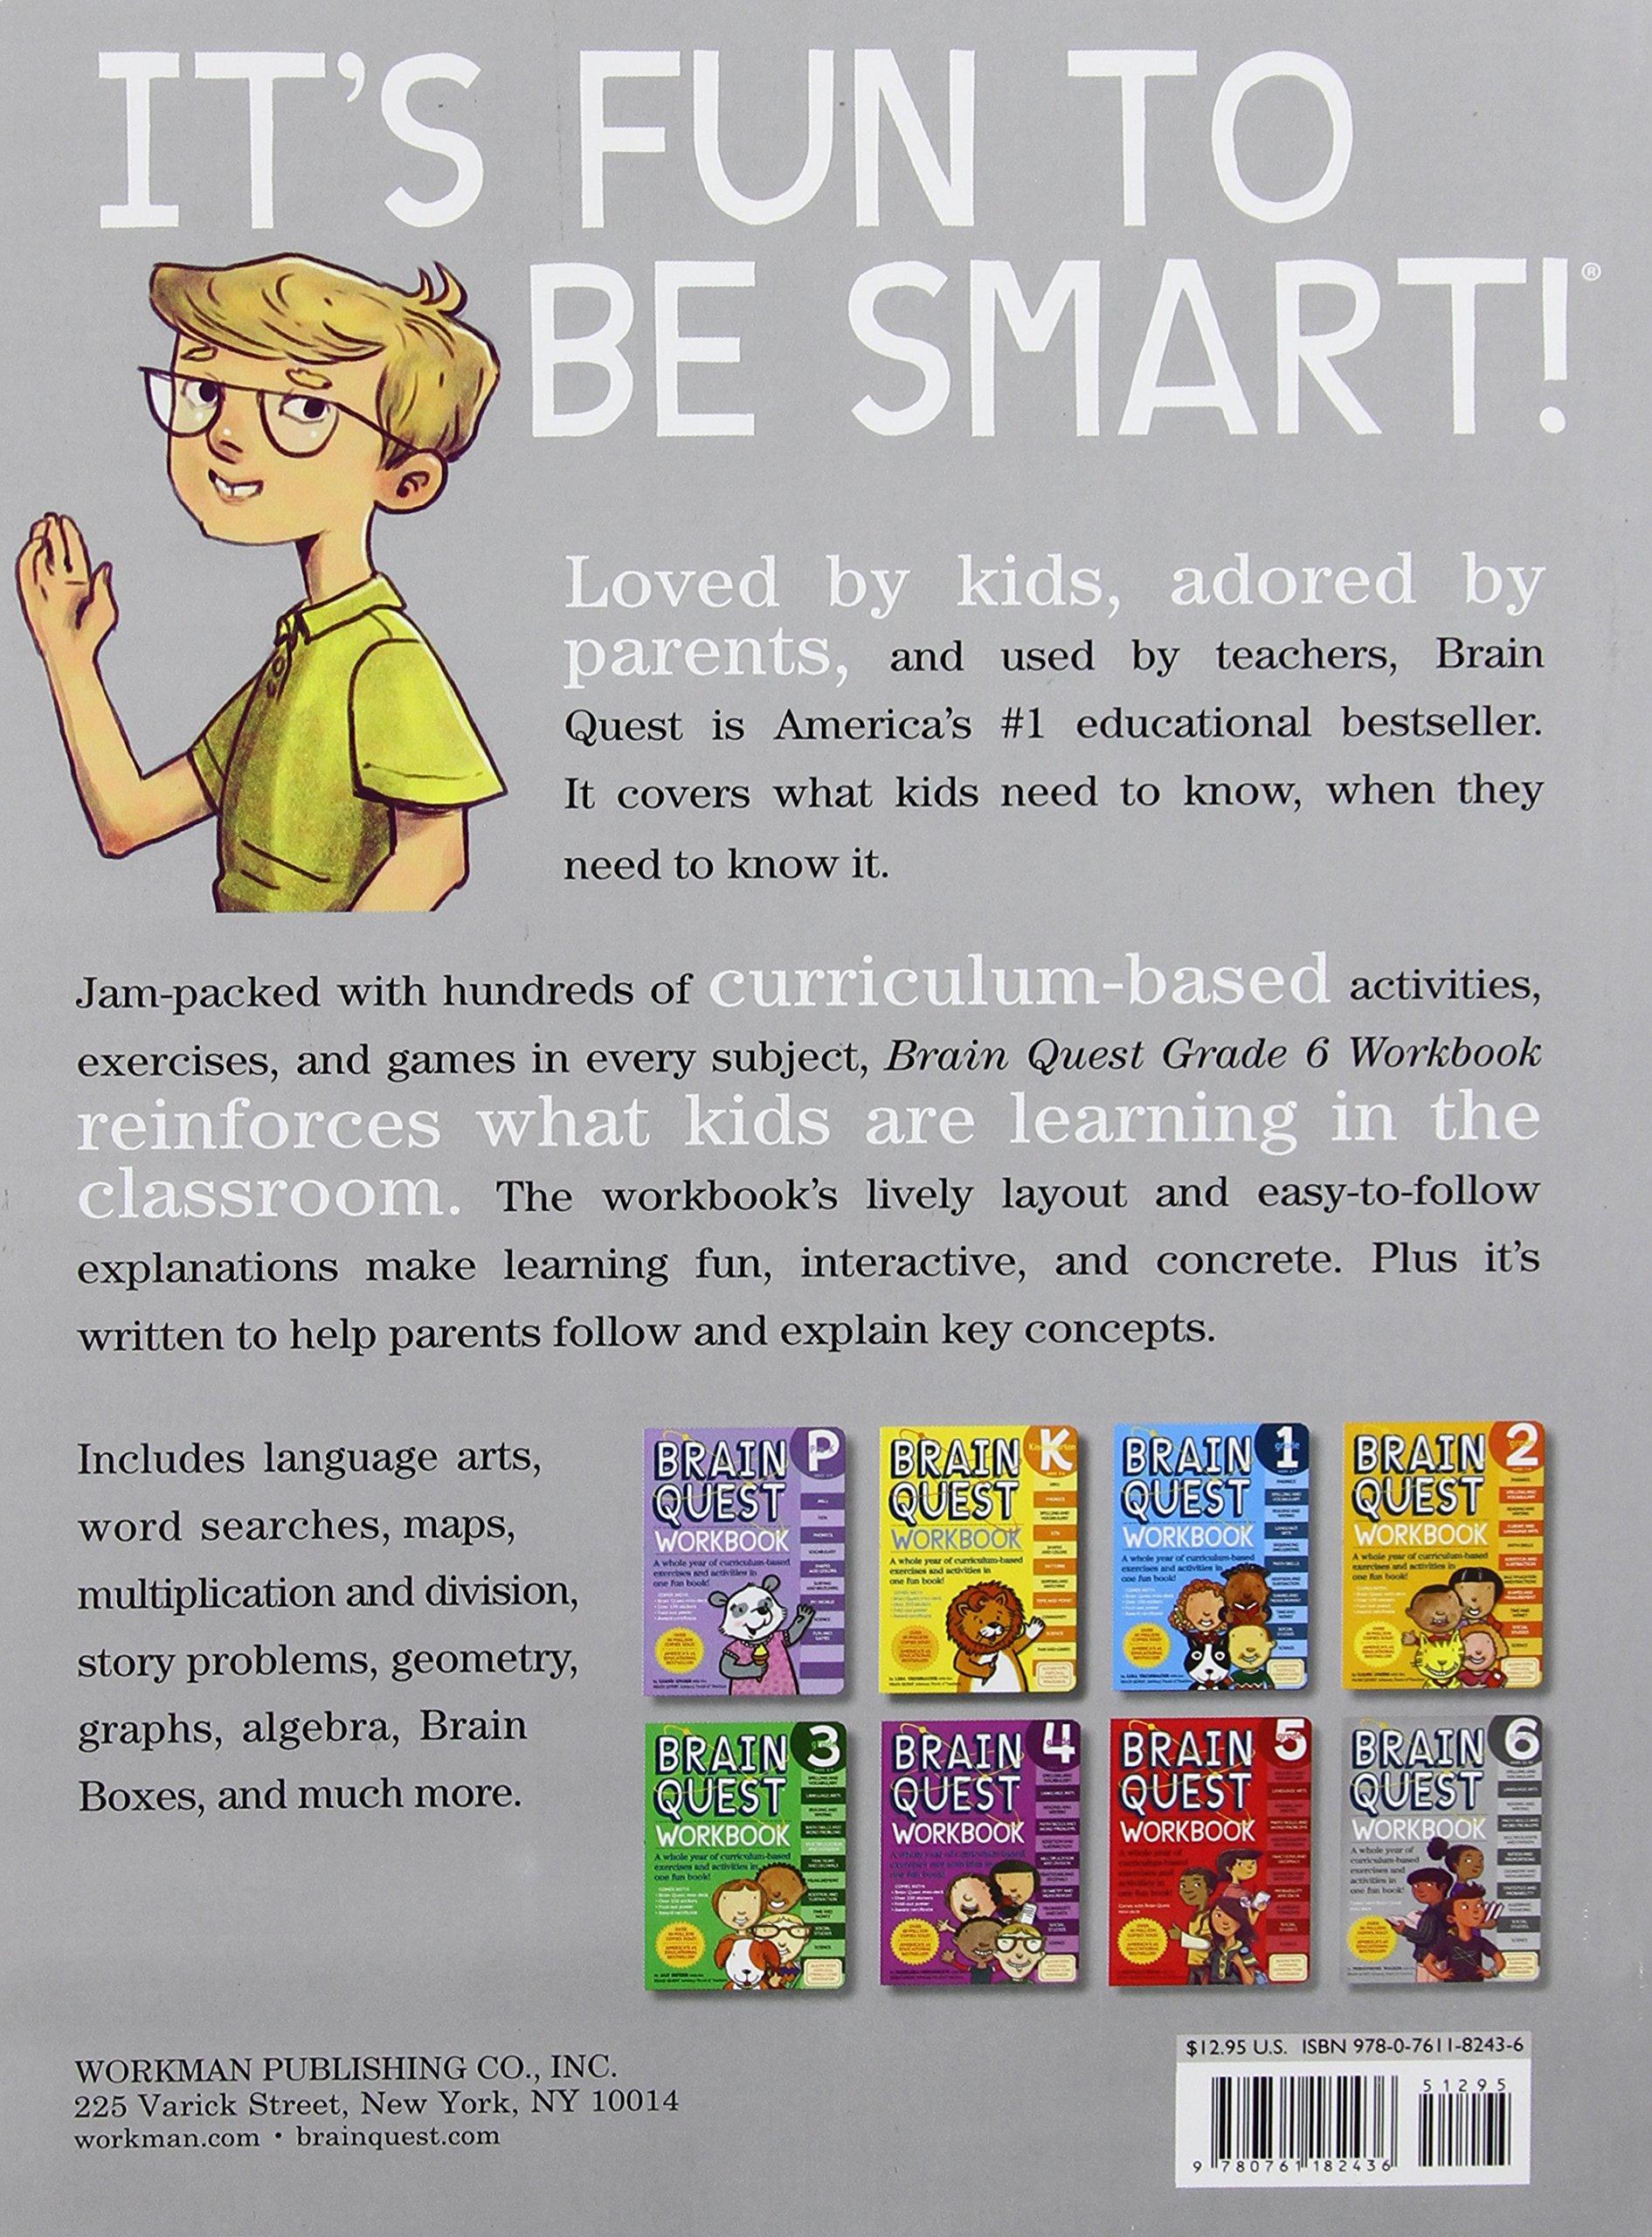 Brain Quest Workbook: Grade 6 by Workman Publishing (Image #1)